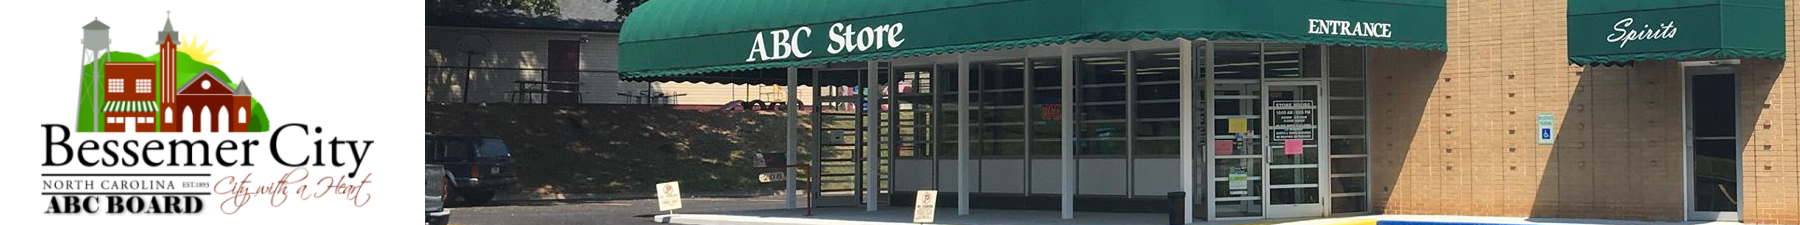 Bessemer City ABC Board